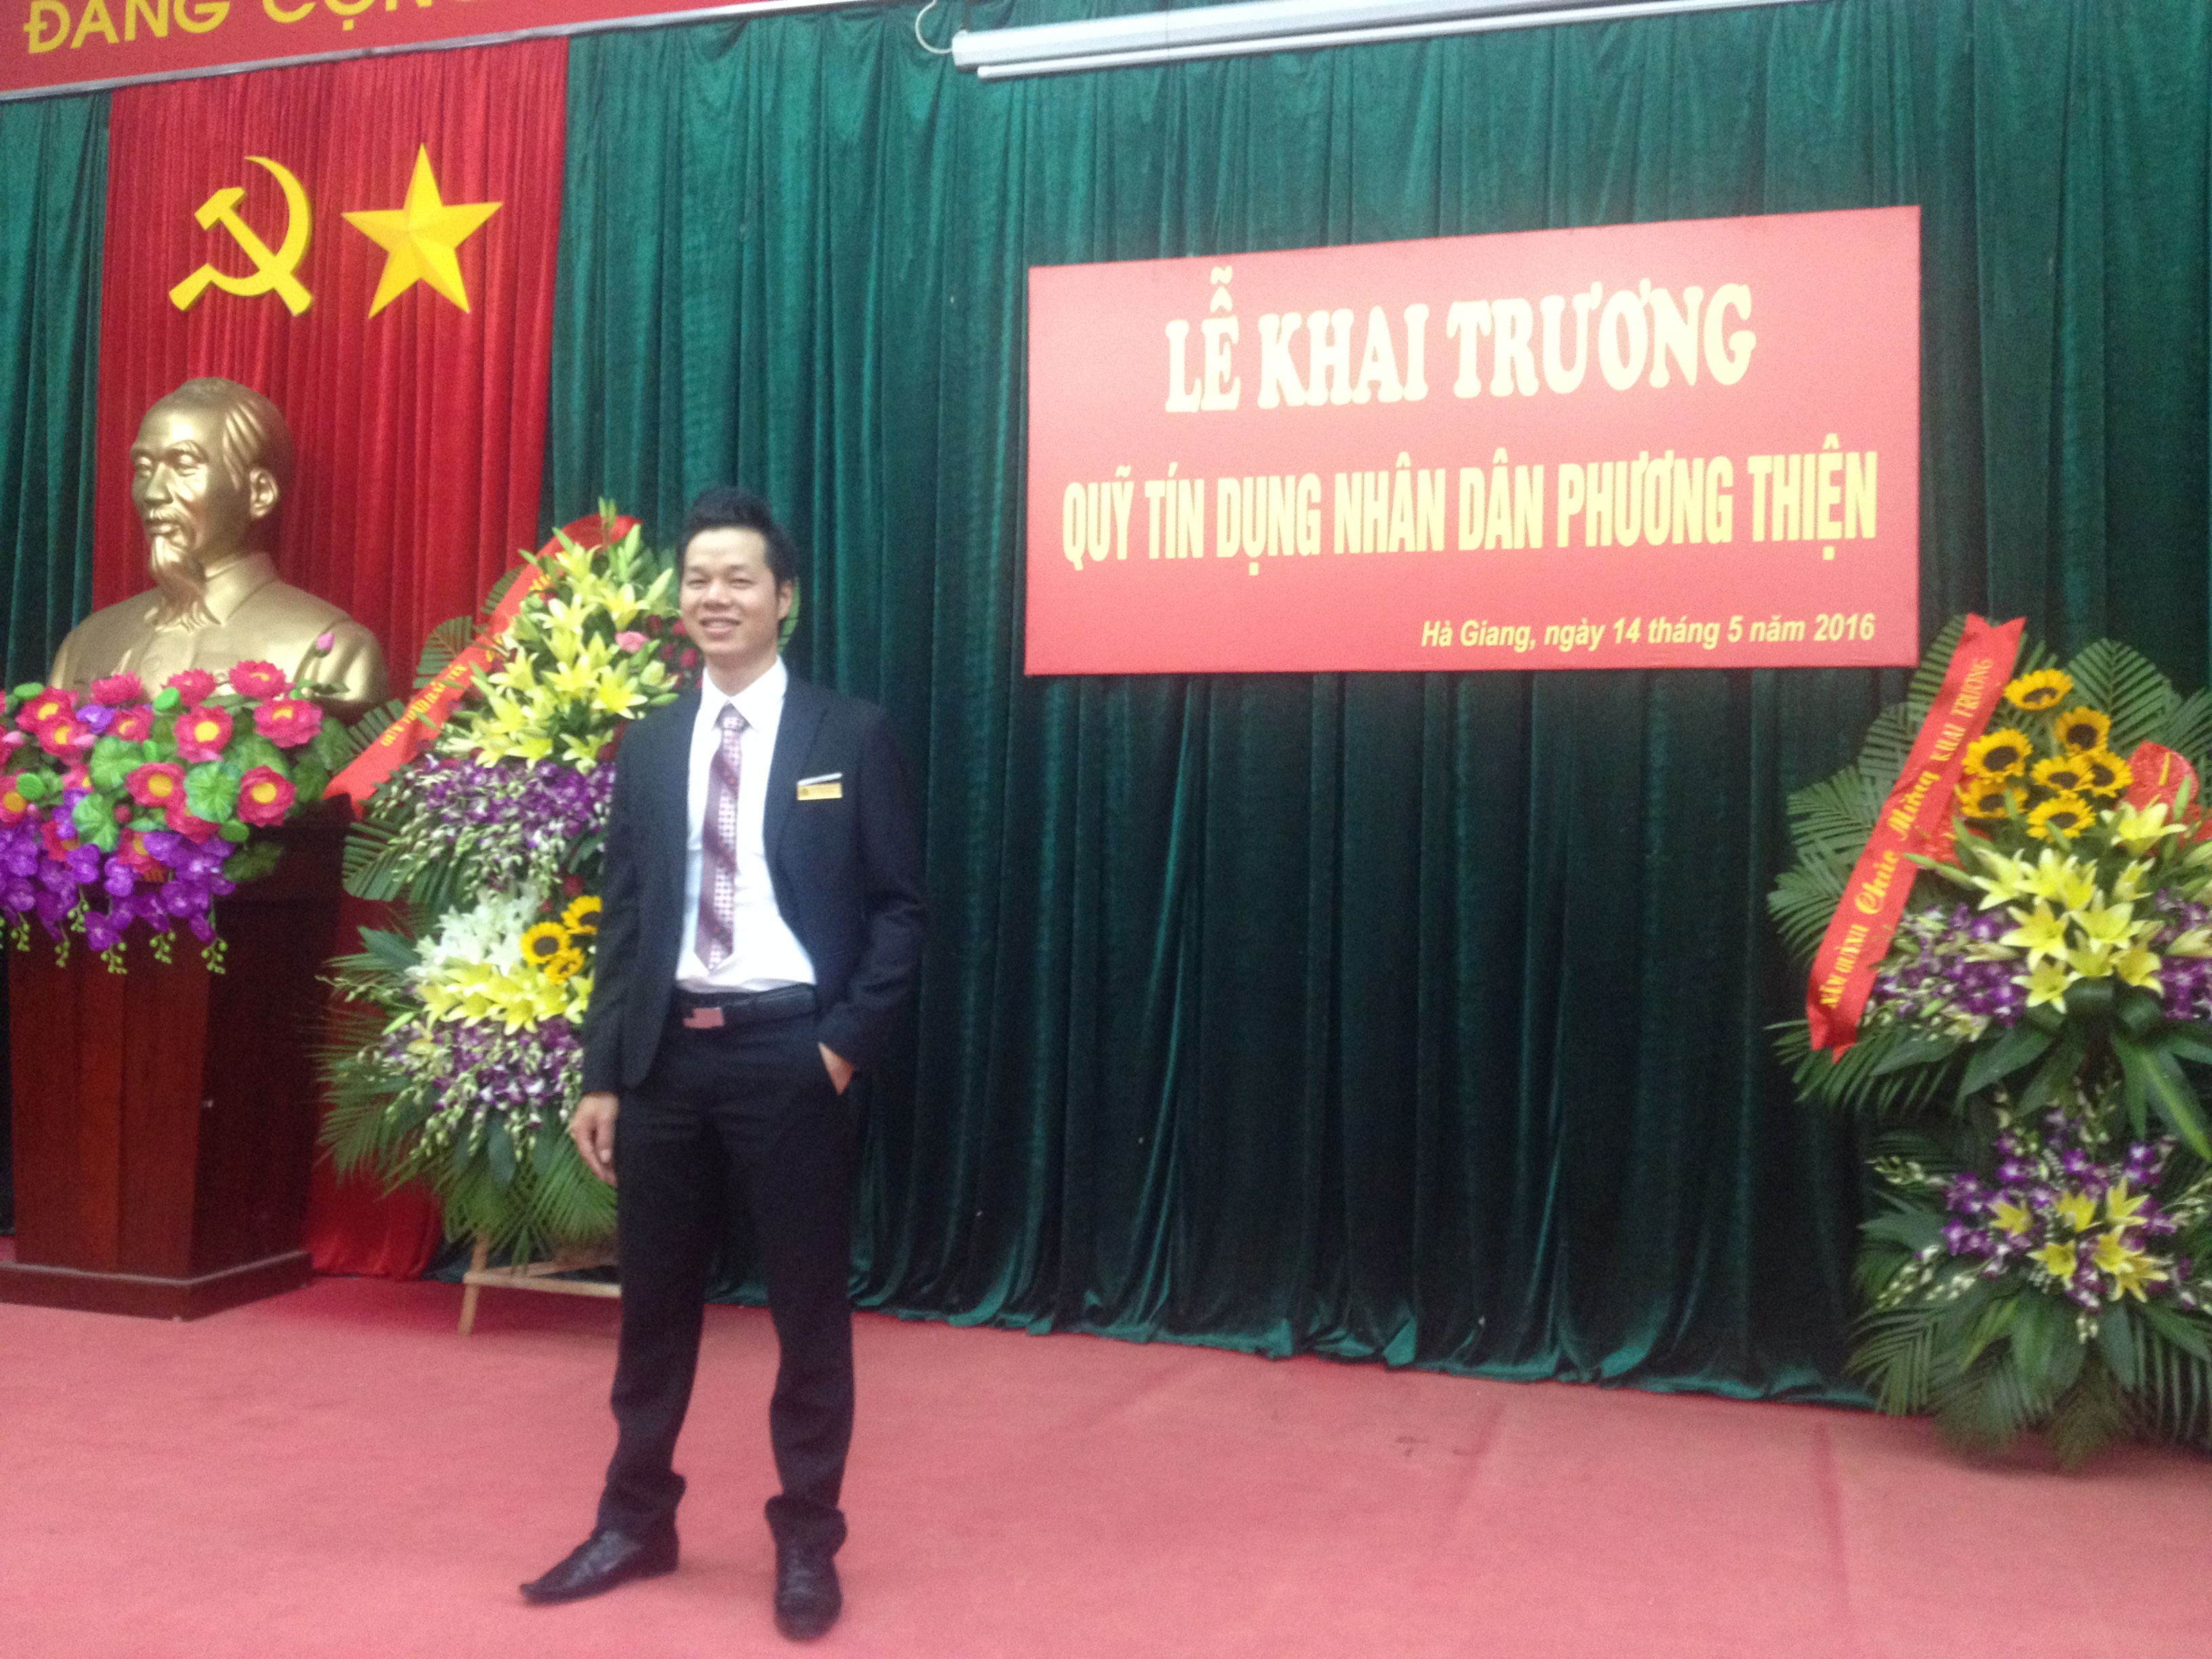 quy tin dung phuong thien-05